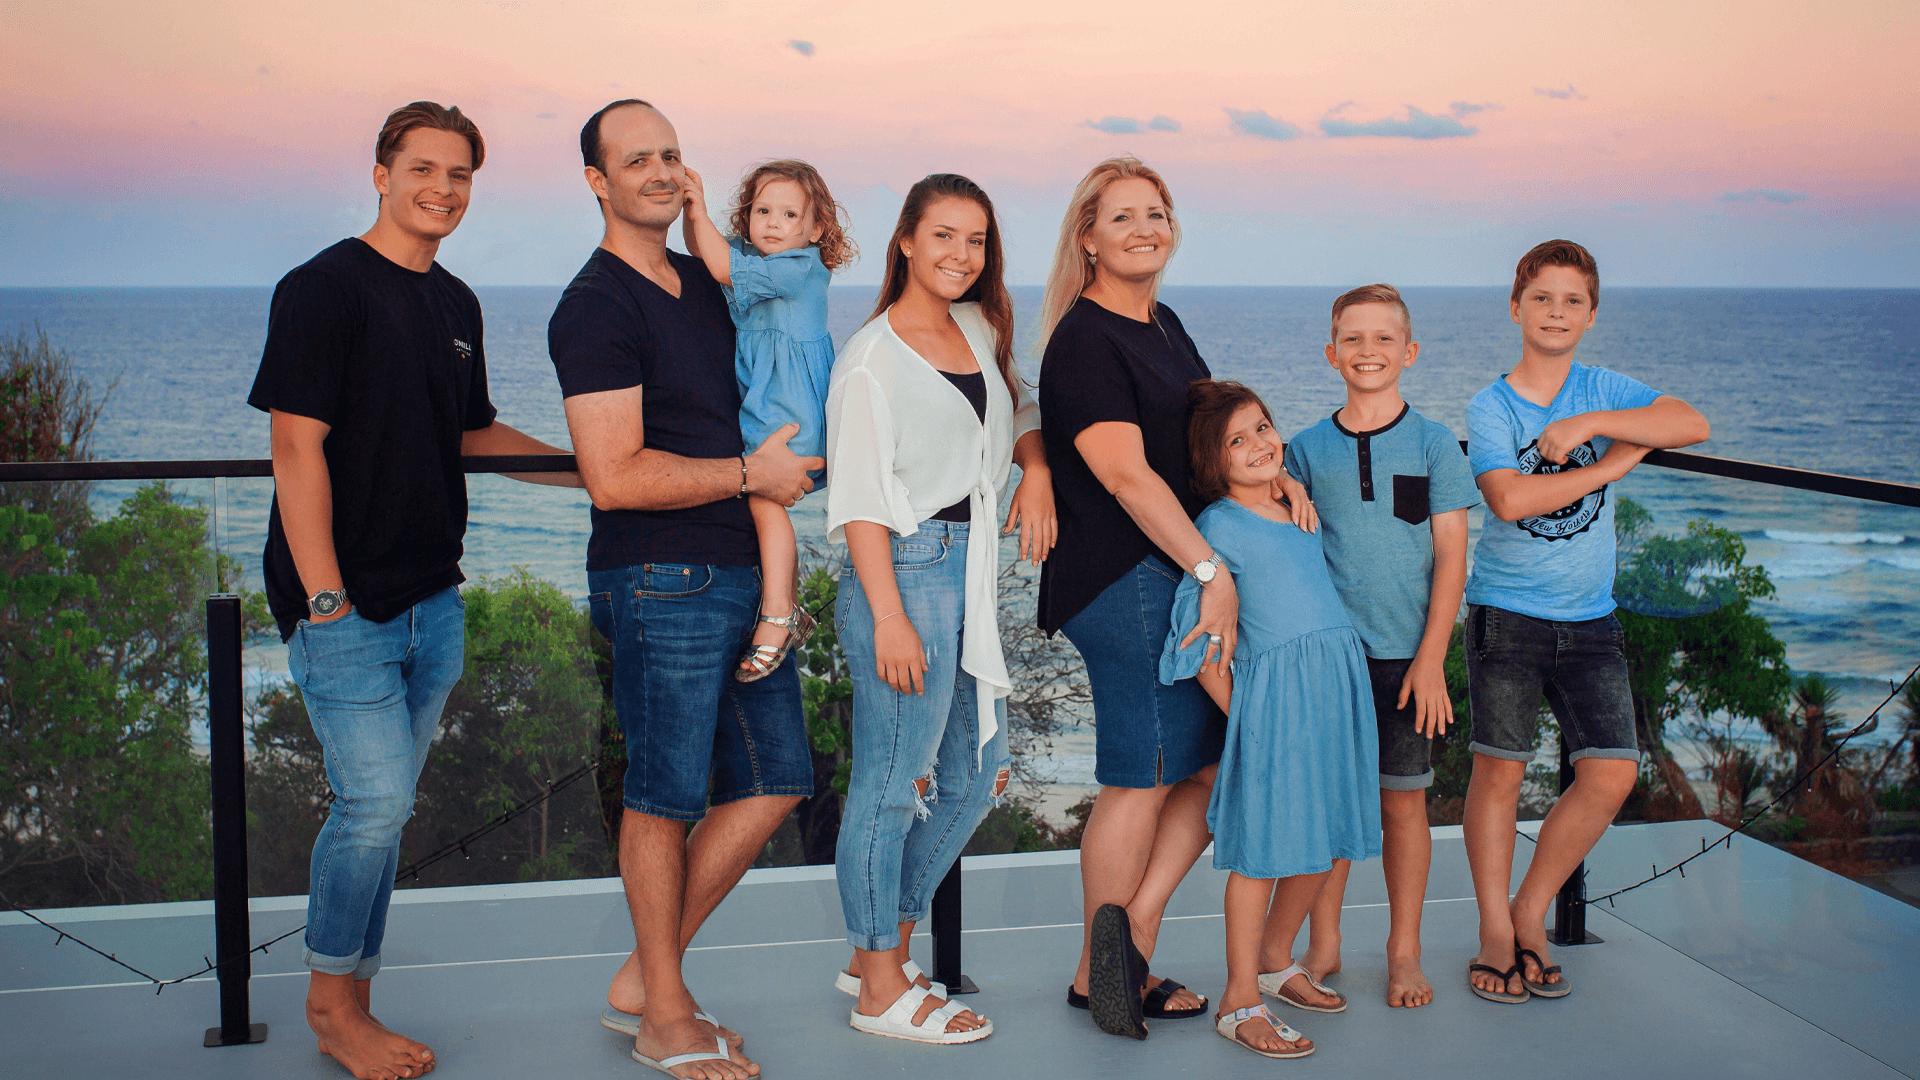 Dr Semaan's family